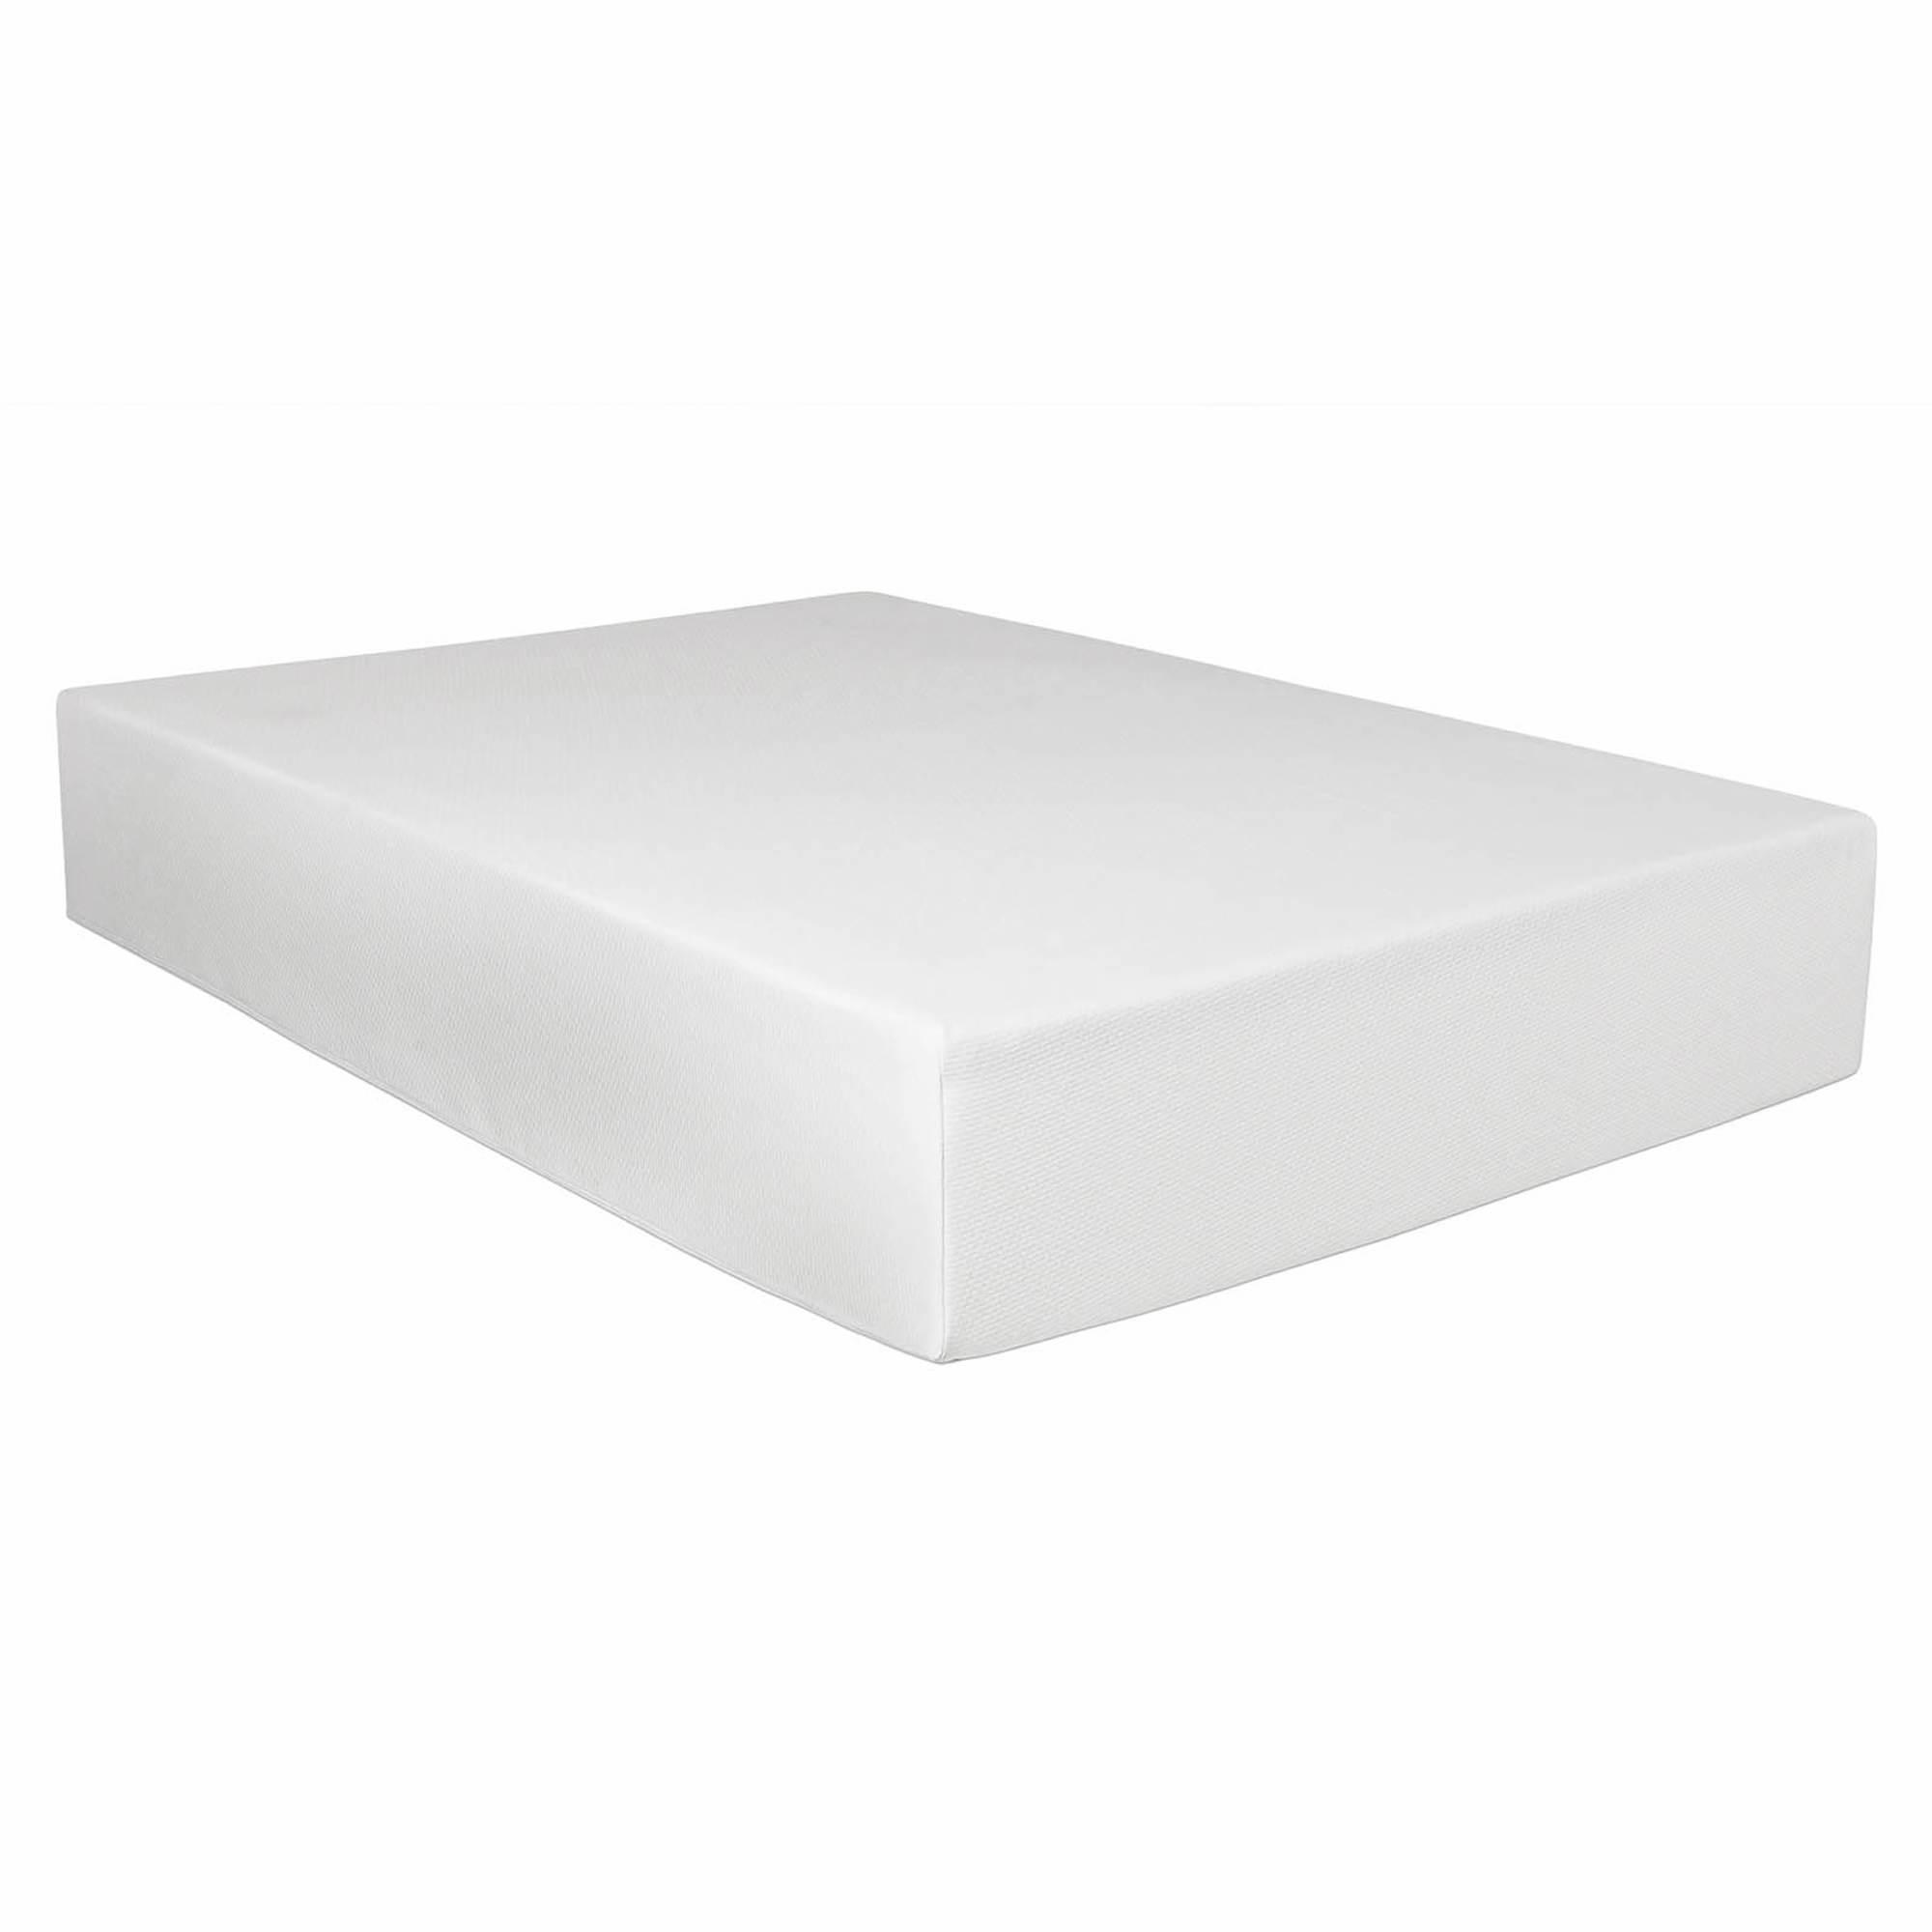 club recipeid queen mattress home gel snuggle foam imageid wholesale profileid bjs product imageservice size memory undefined